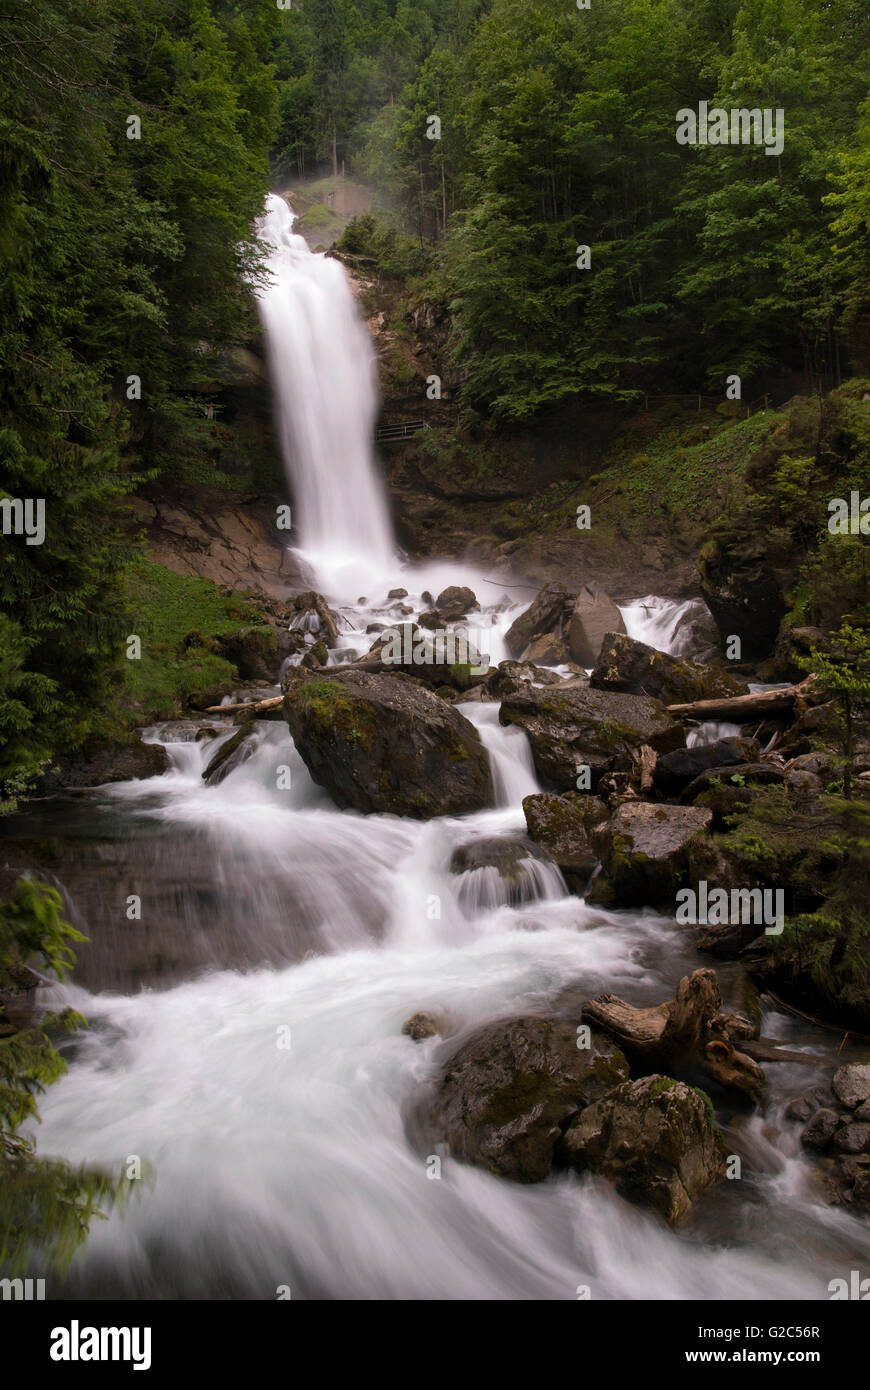 The Giessbach falls near the Swiss town Brienz Stock Photo